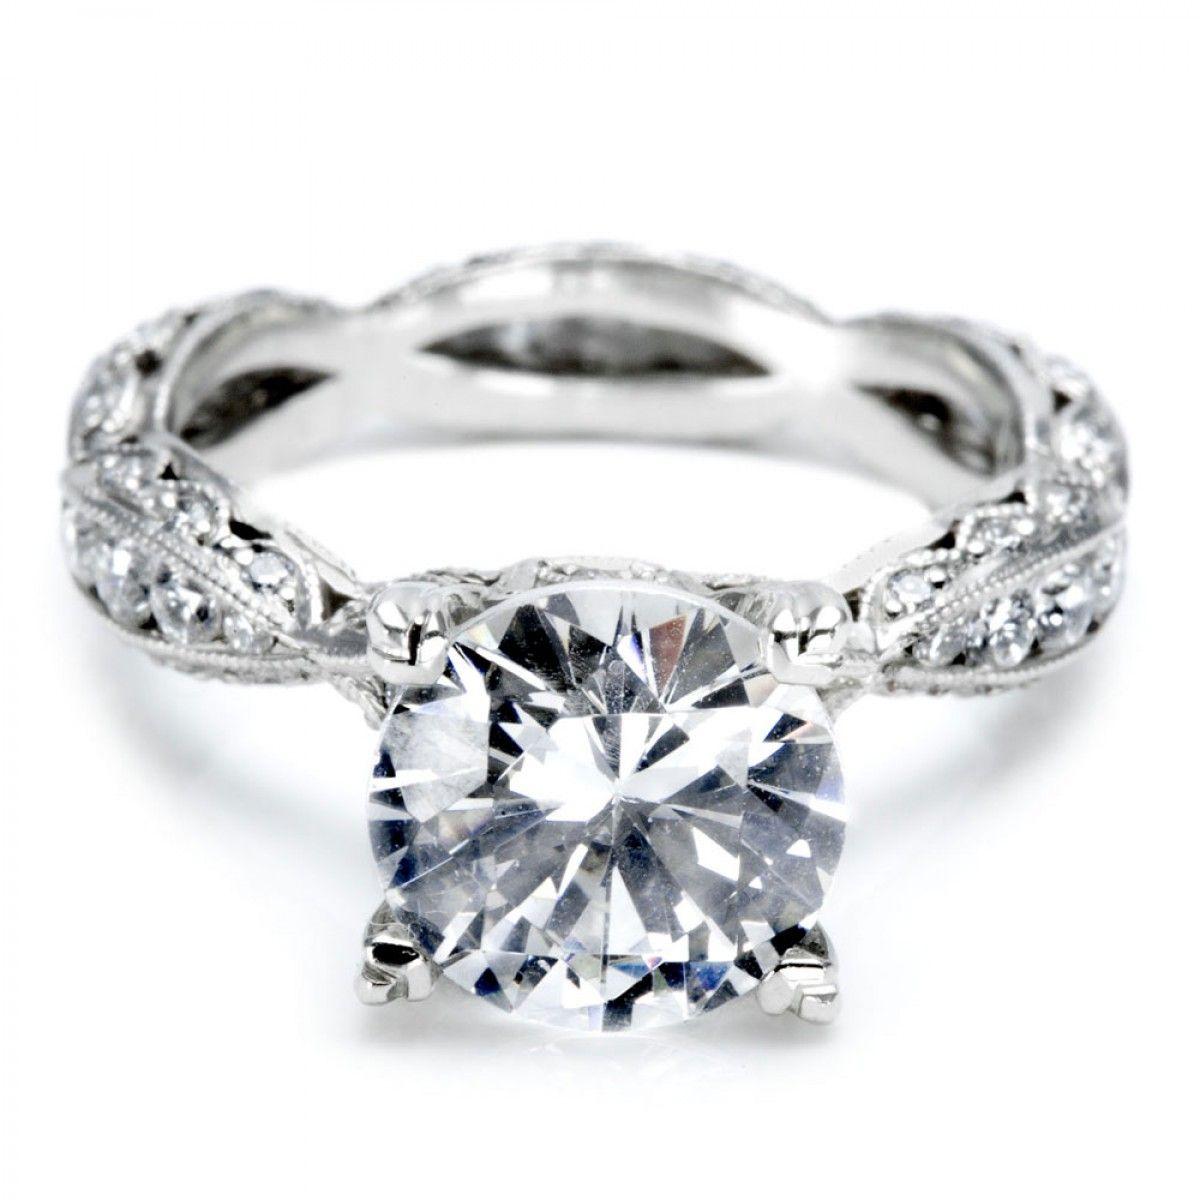 Crescent silhouette tacori engagement rings rose gold